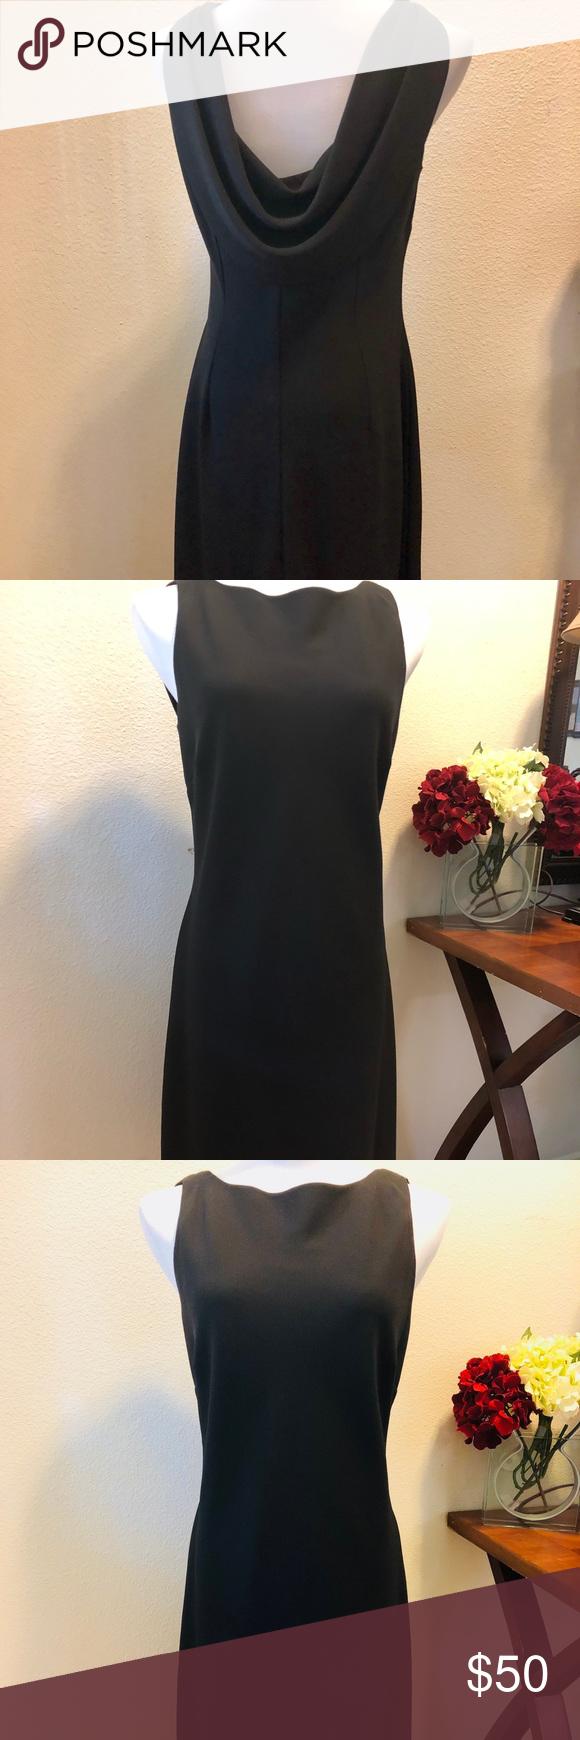 Cascading Back Dress Chiffon Fashion Clothes Design Fashion [ 1740 x 580 Pixel ]